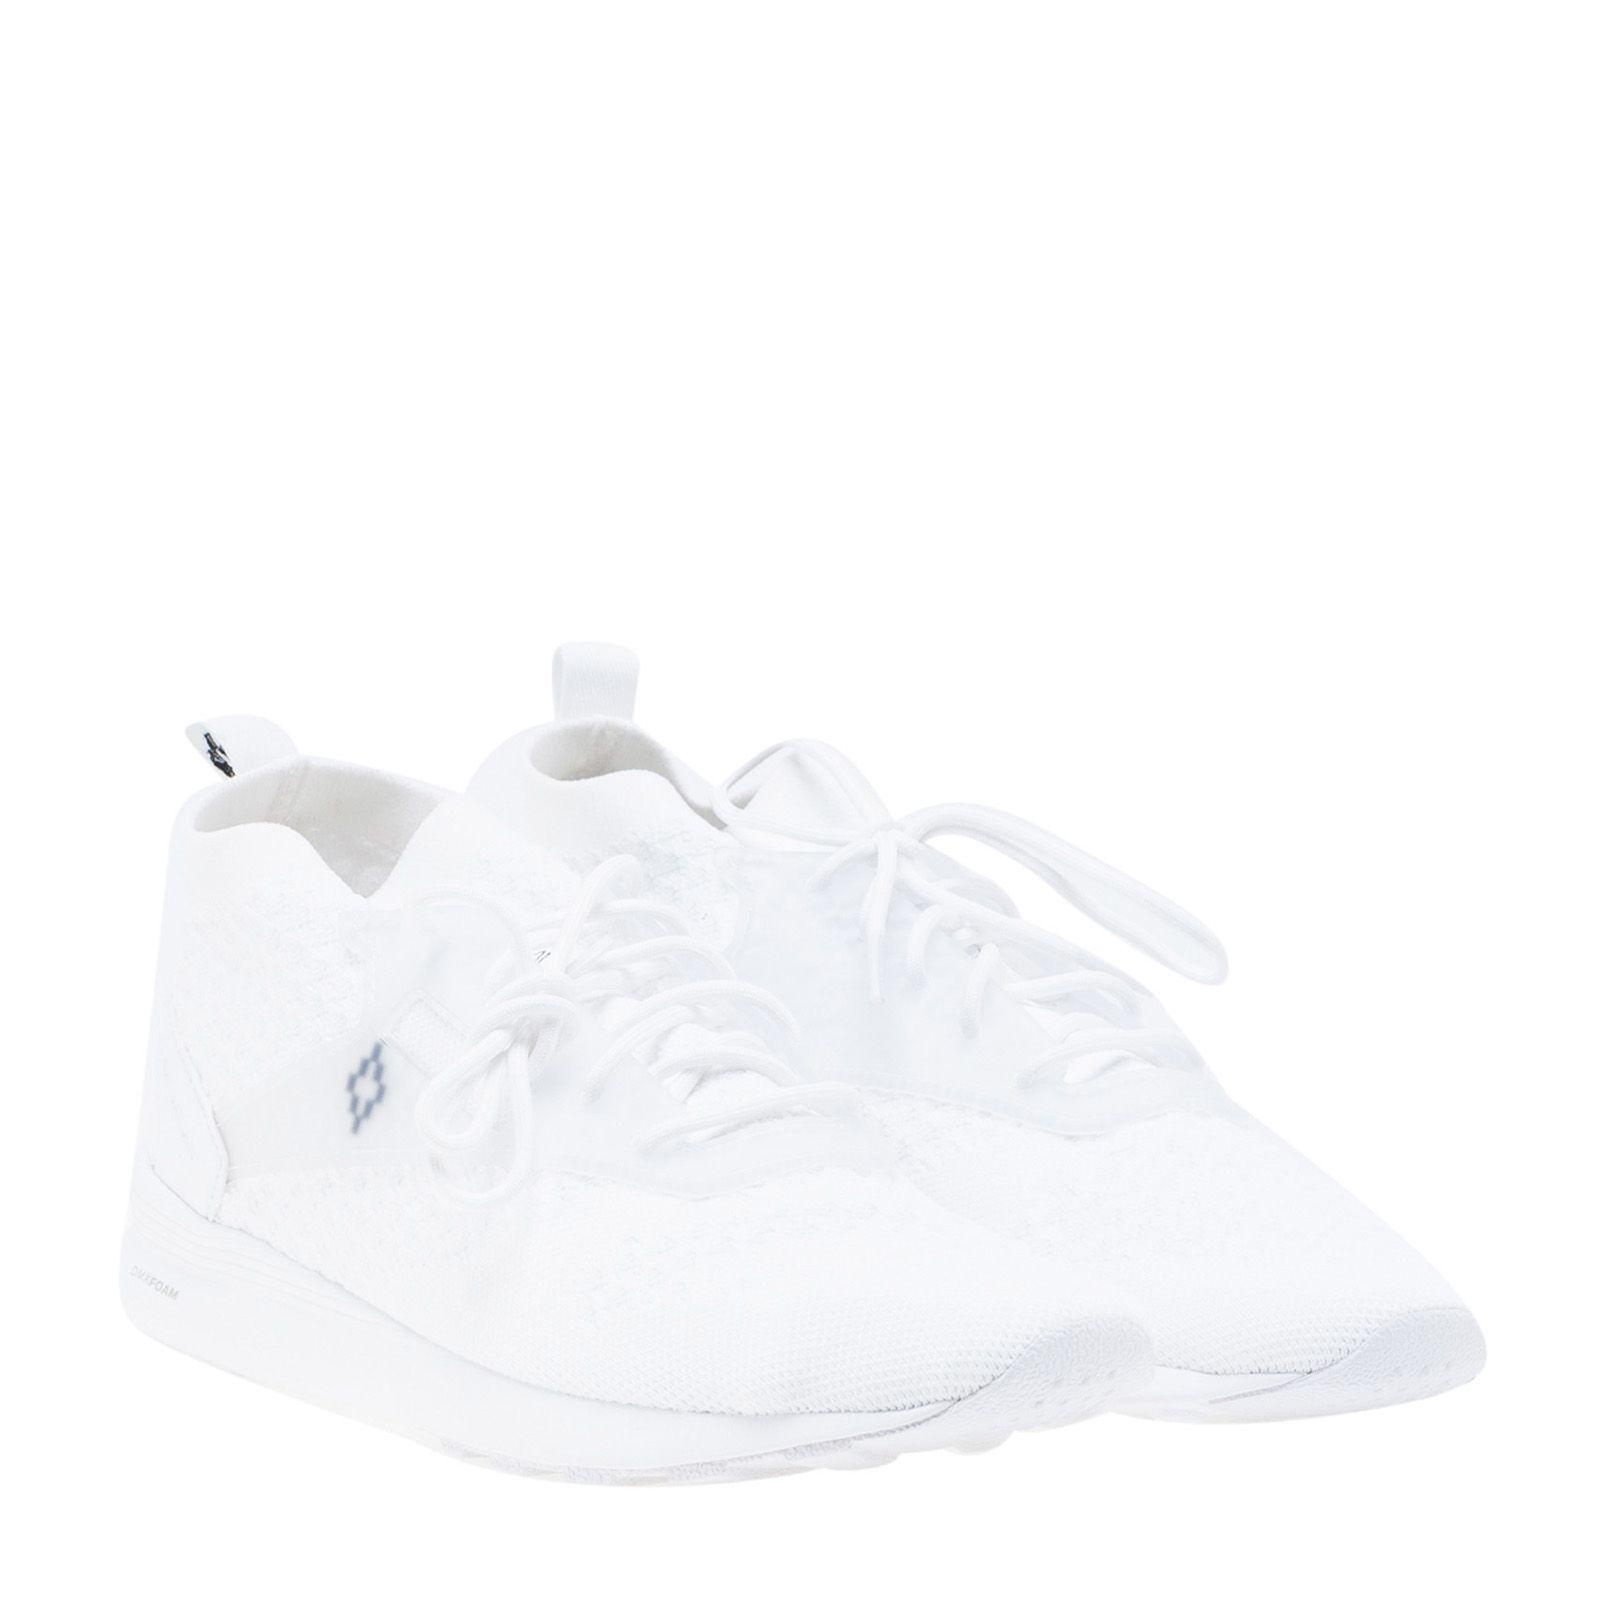 Marcelo Burlon County Of Milan Marcelo Burlon X Reebok Zoku Sneakers